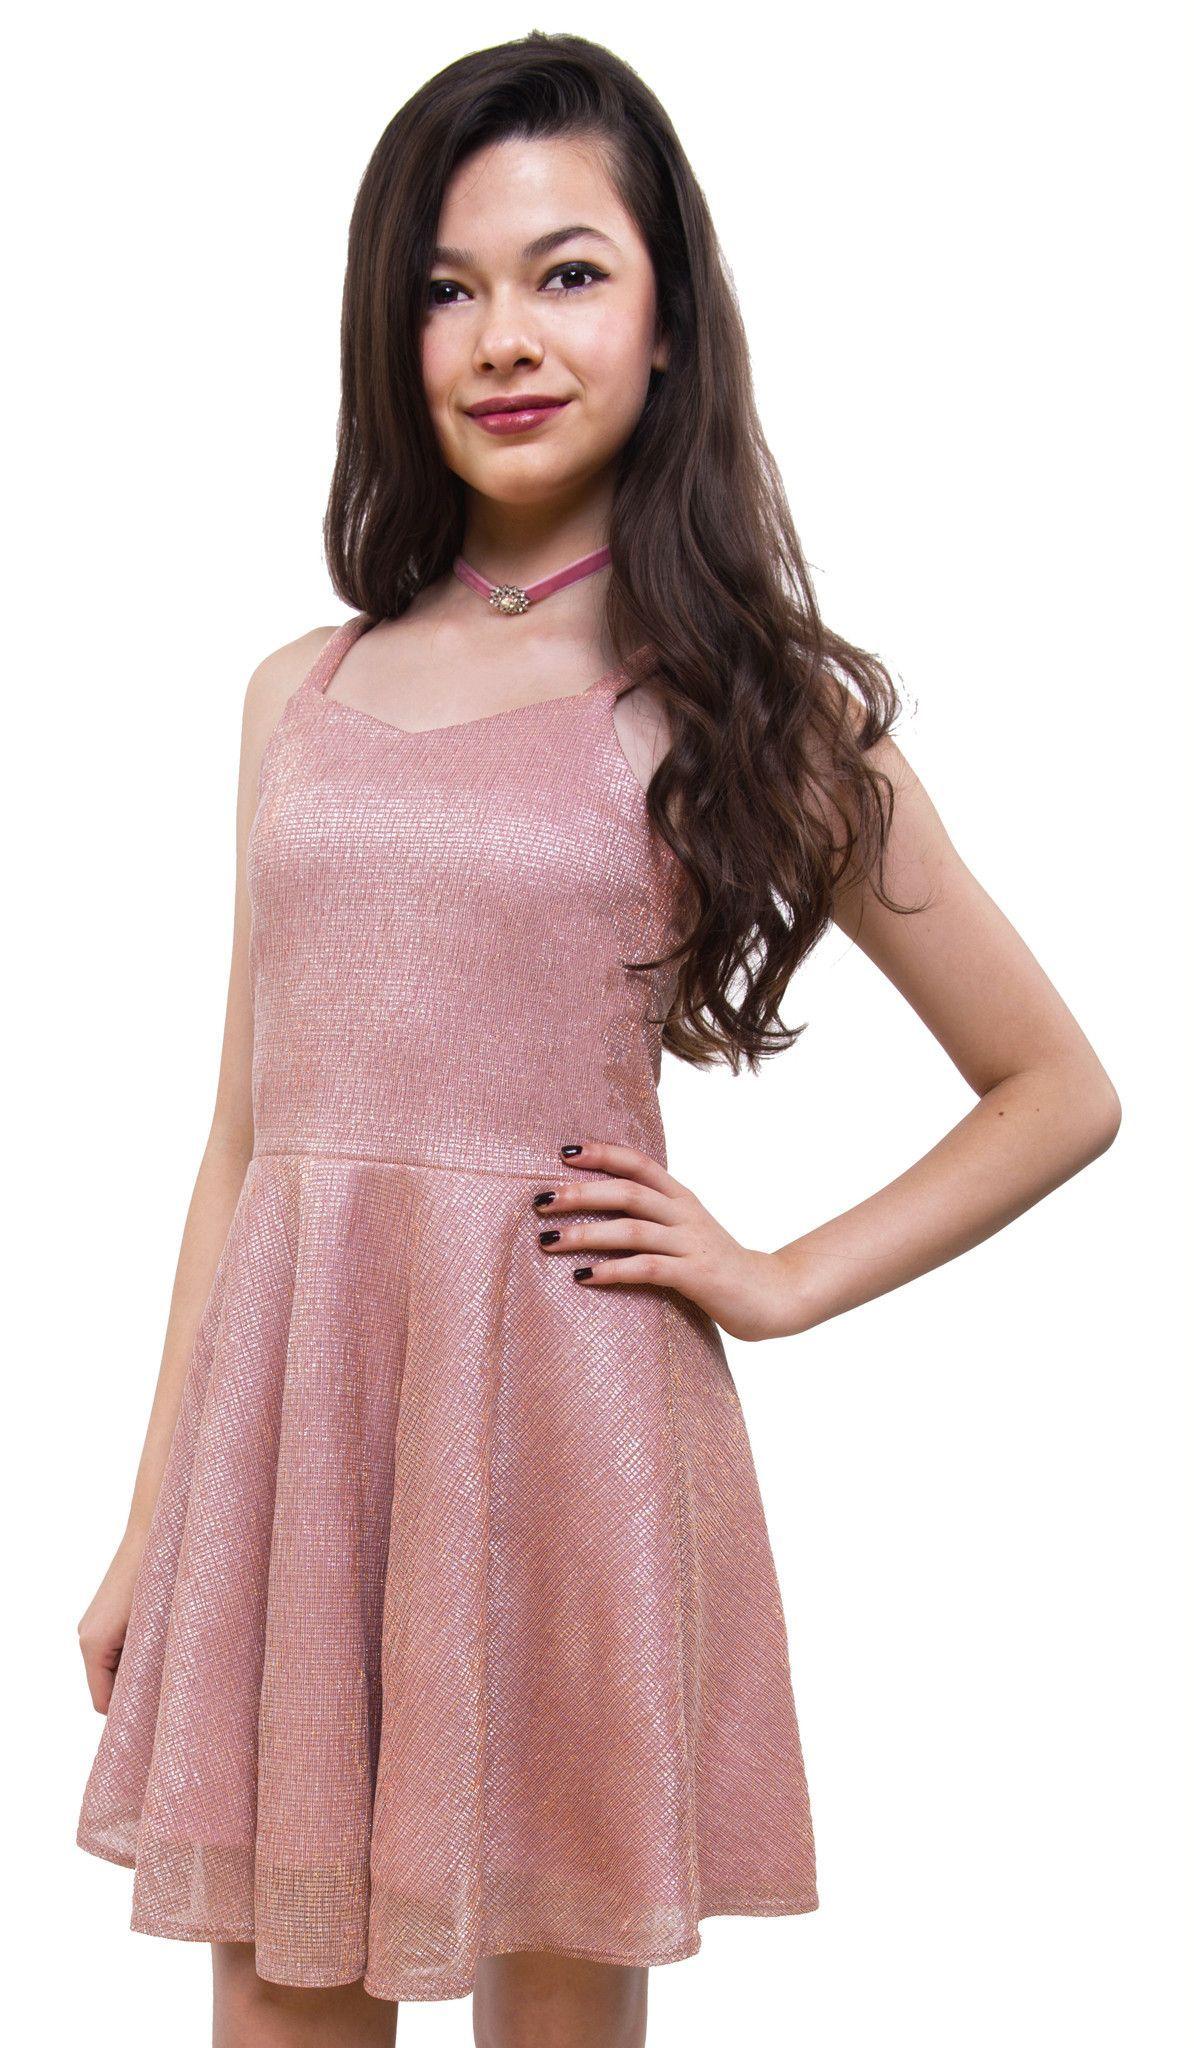 THE ELSA DRESS -2759 | Products | Pinterest